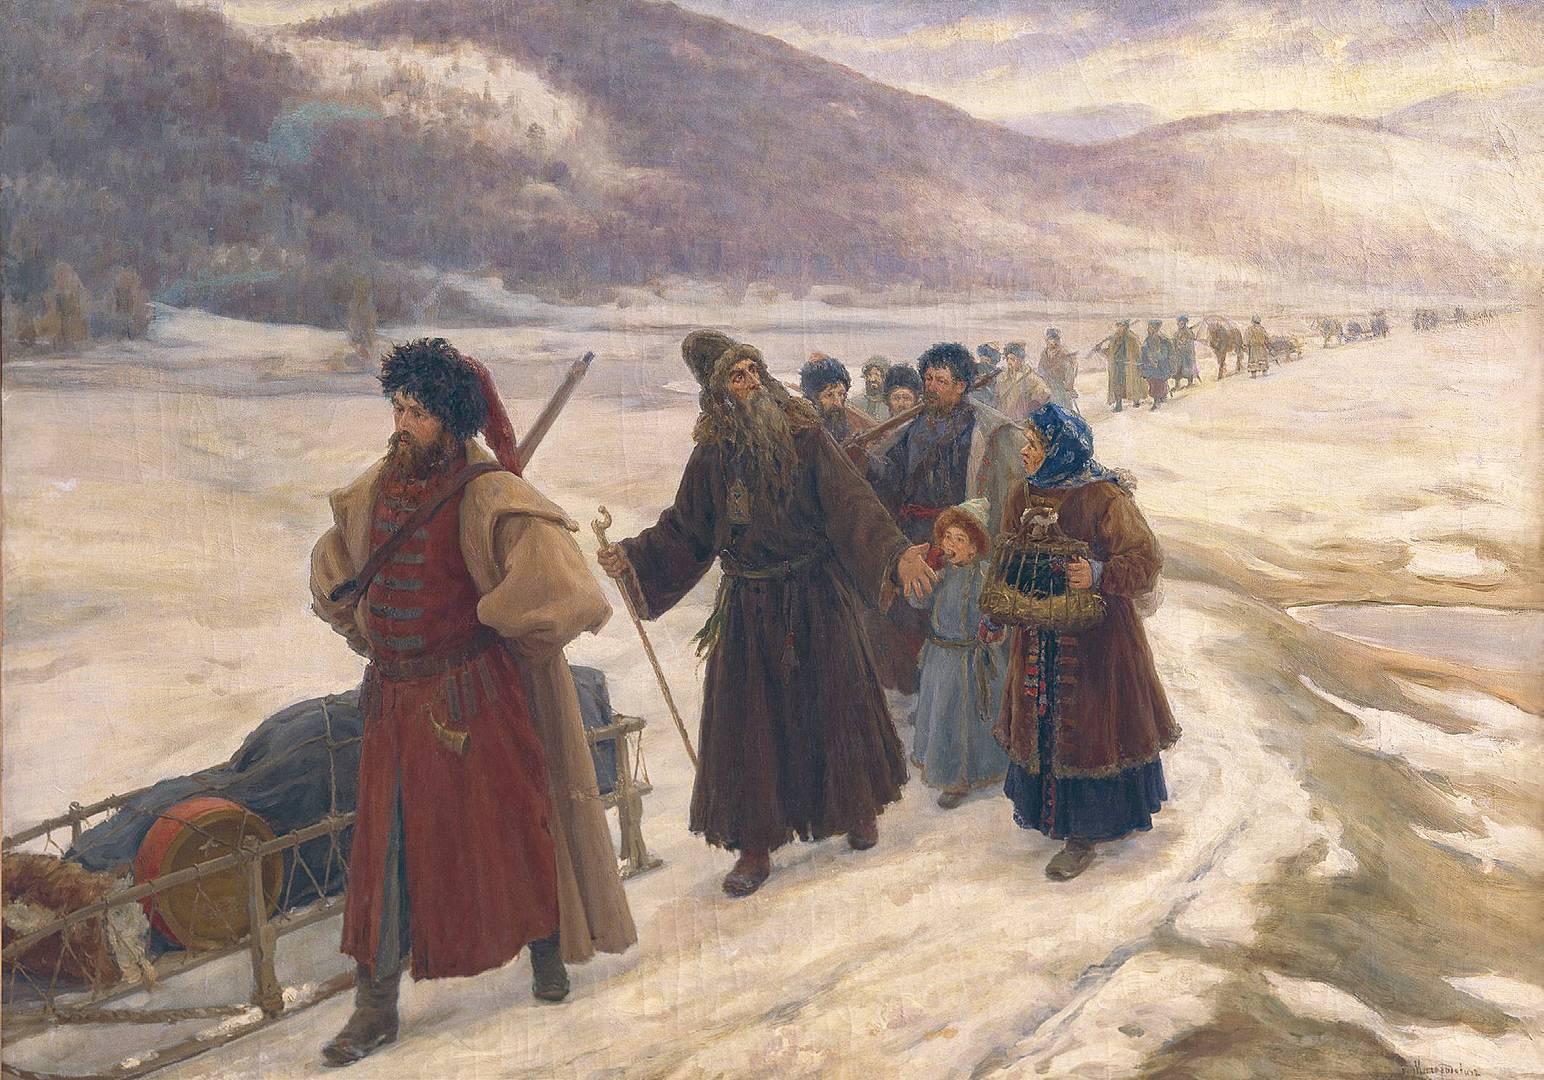 Сергей Милорадович. Путешествие Аввакума по Сибири. 1898